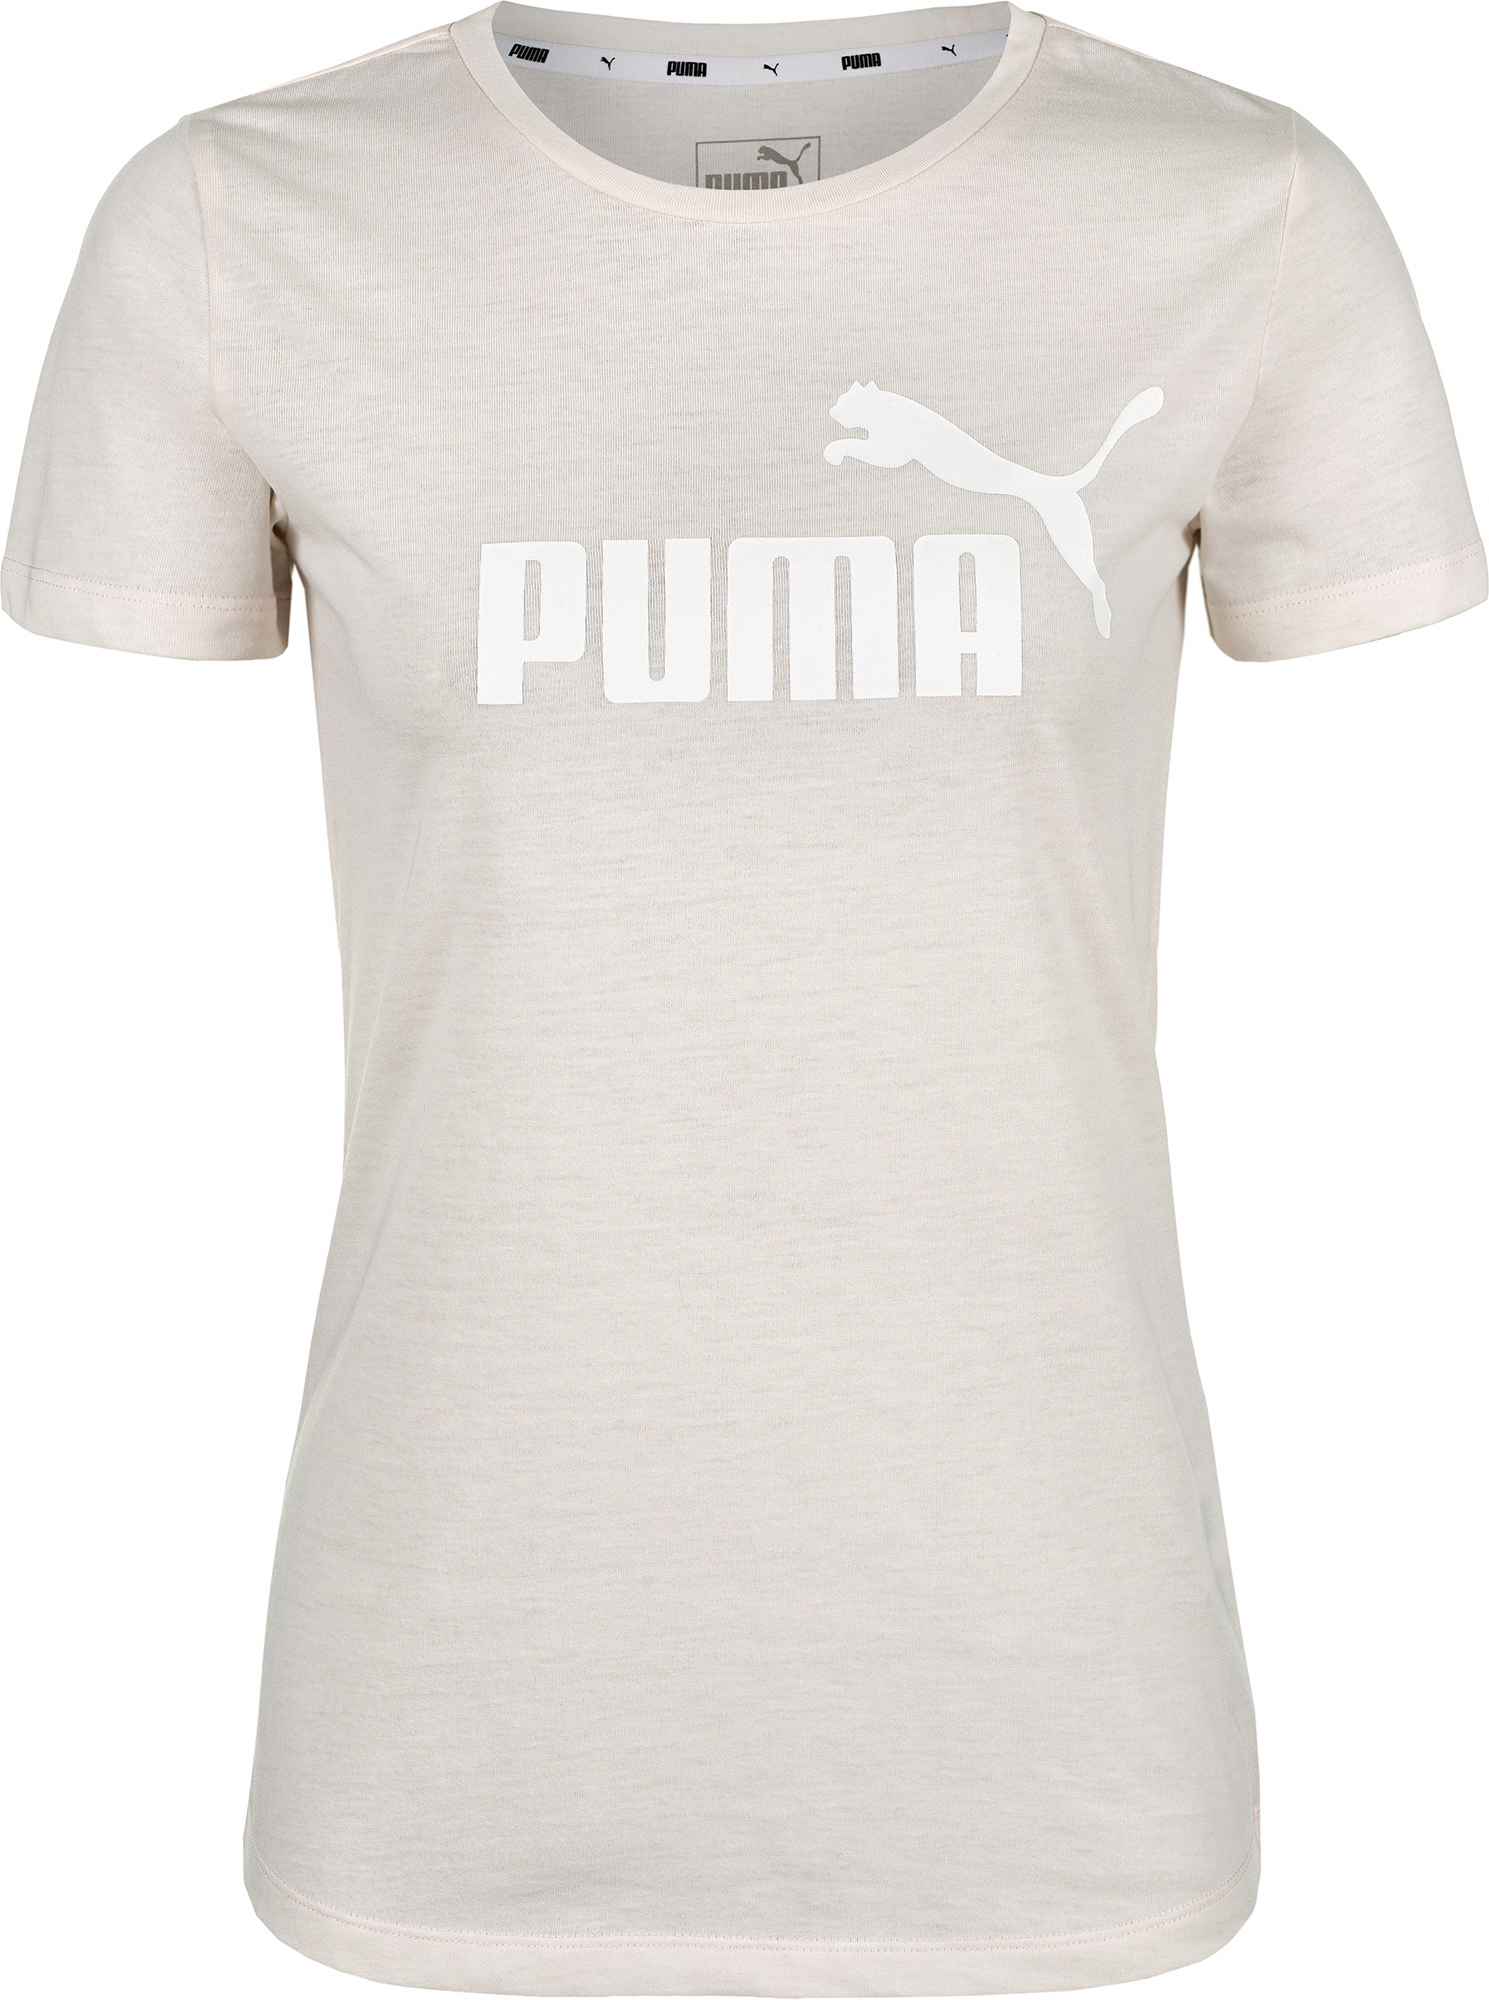 Puma Футболка женская Puma ESS+ Logo Heather Tee, размер 46-48 футболка женская puma ess no 1 tee heather w цвет синий 83839920 размер s 42 44